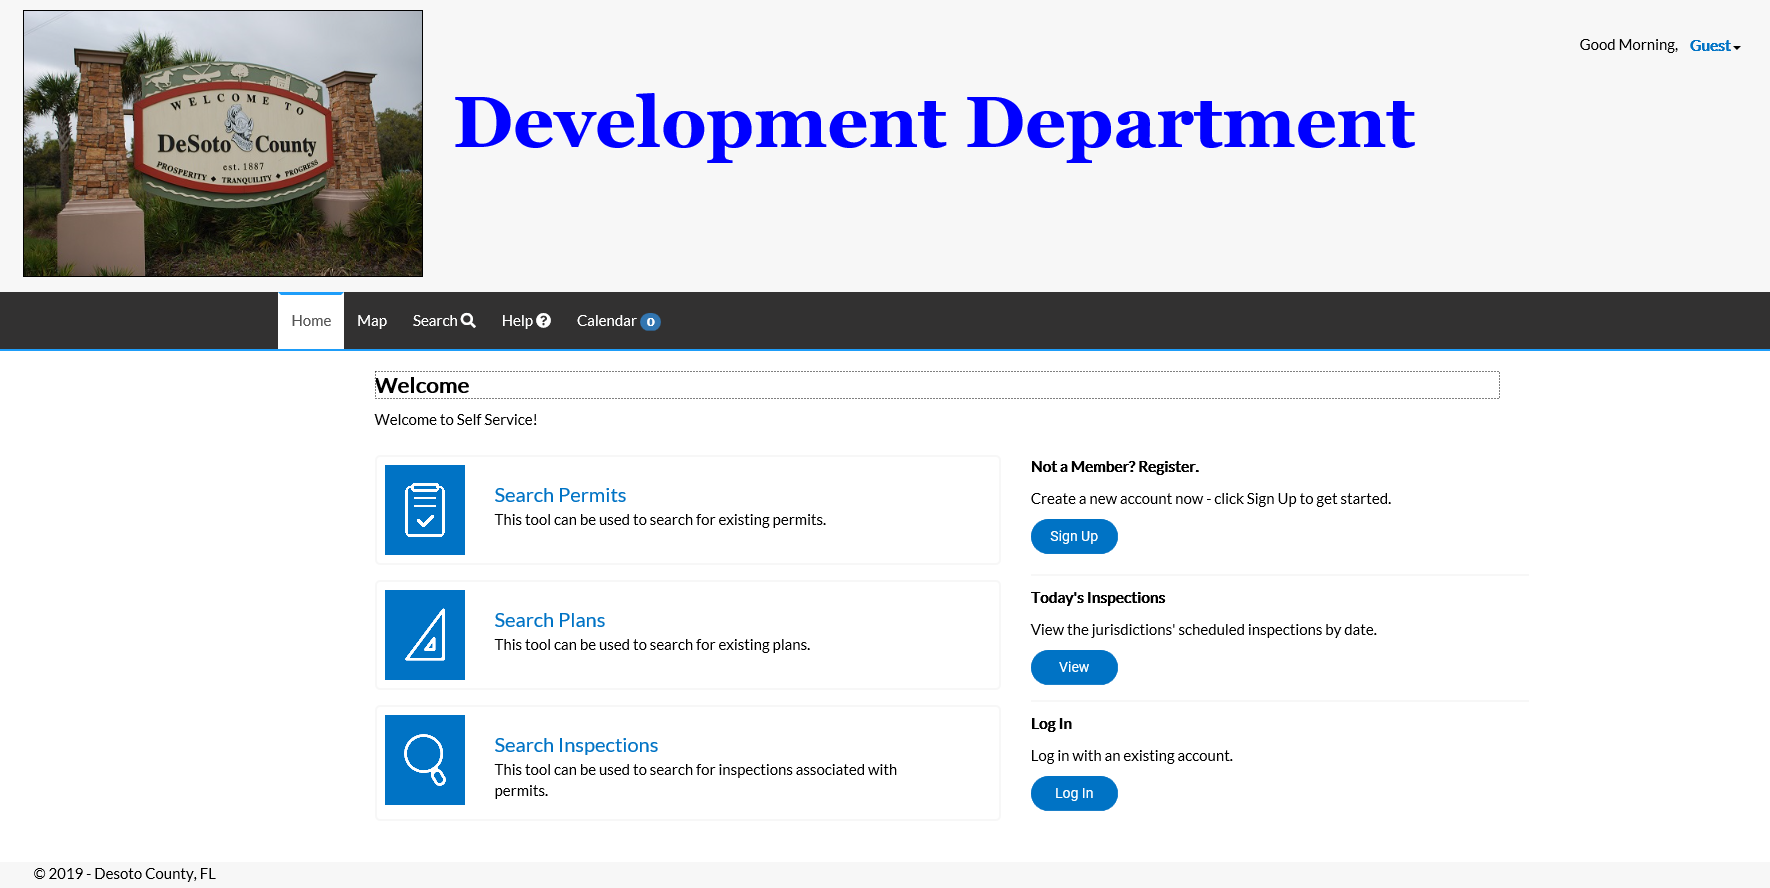 Development Department